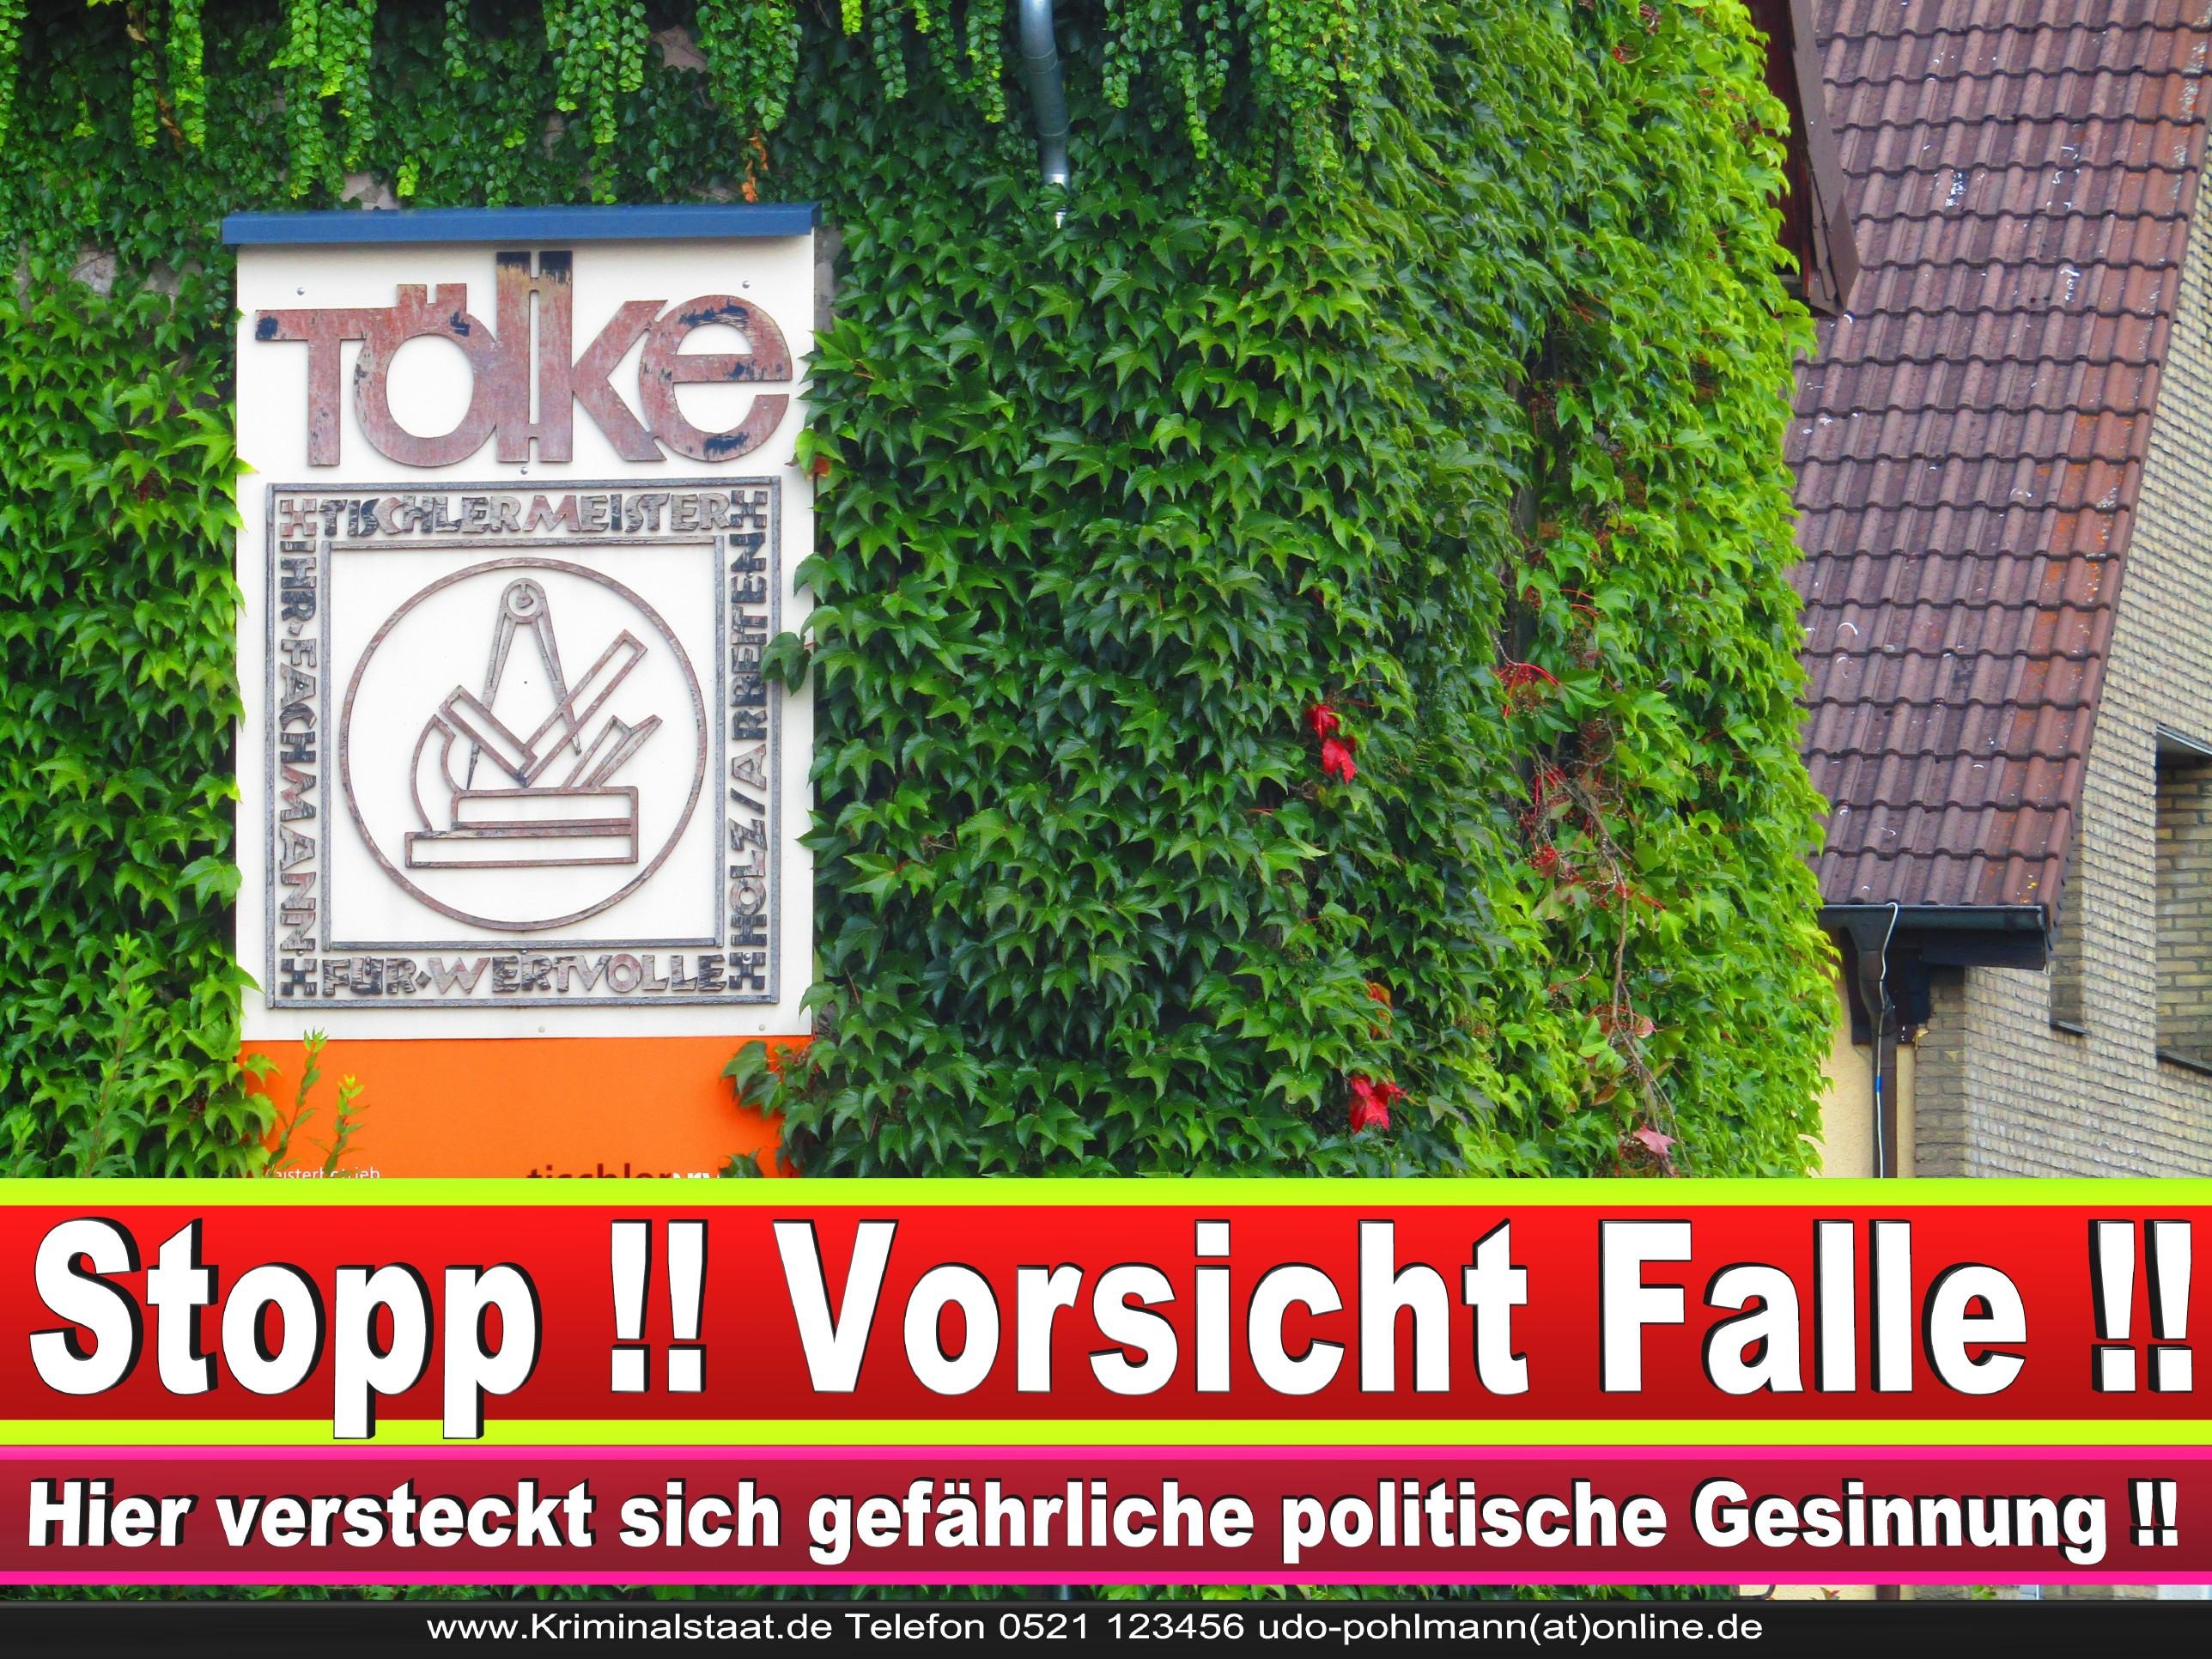 TISCHLEREI TOELKE CDU BIELEFELD TÖLKE 6 LANDTAGSWAHL BUNDESTAGSWAHL BÜRGERMEISTERWAHL